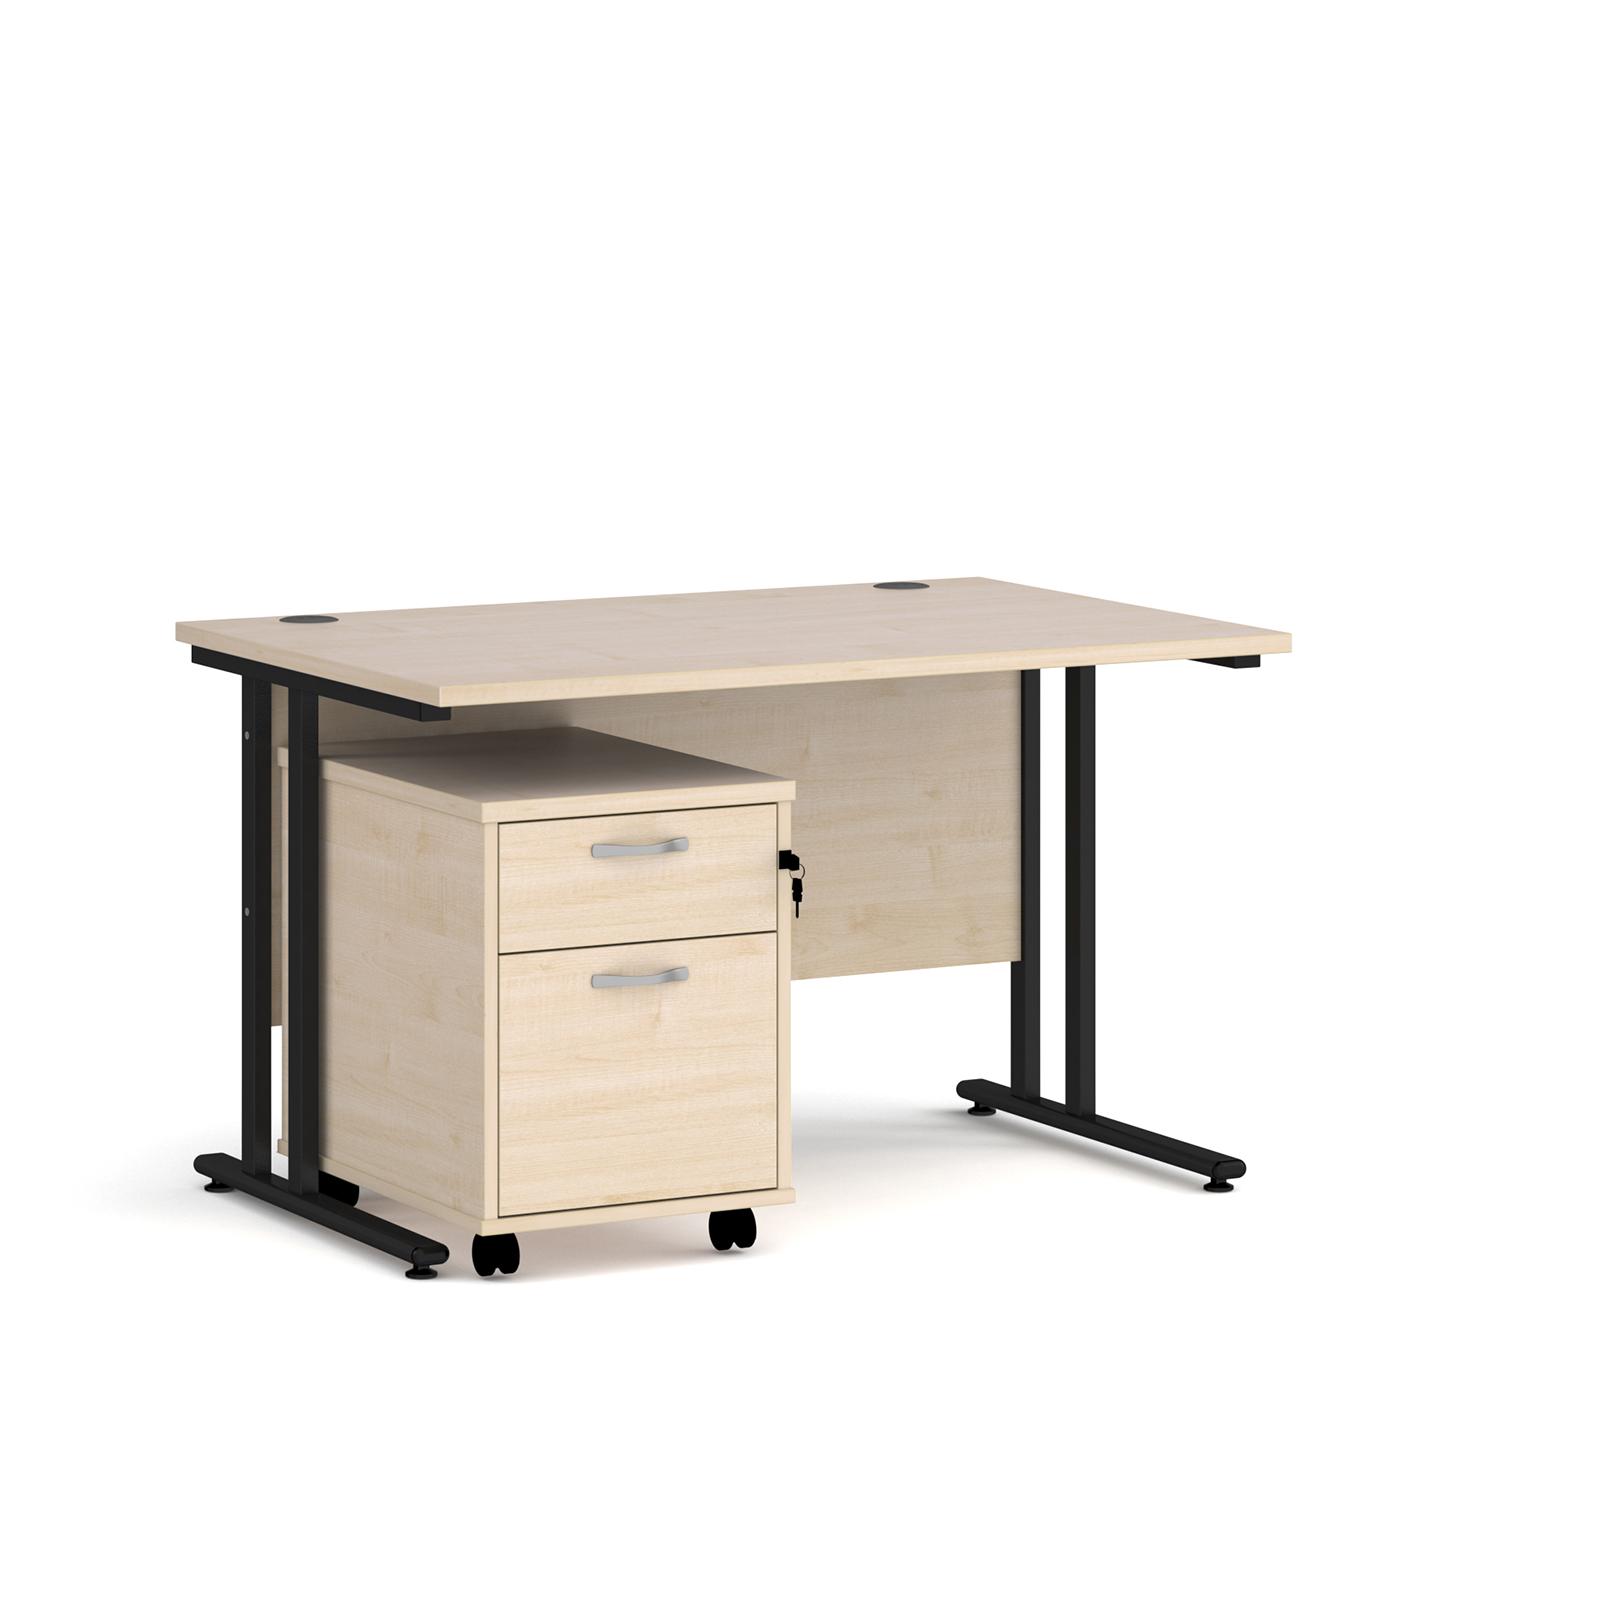 Rectangular Desks Maestro 25 straight desk 1200mm x 800mm with black cantilever frame and 2 drawer pedestal - maple